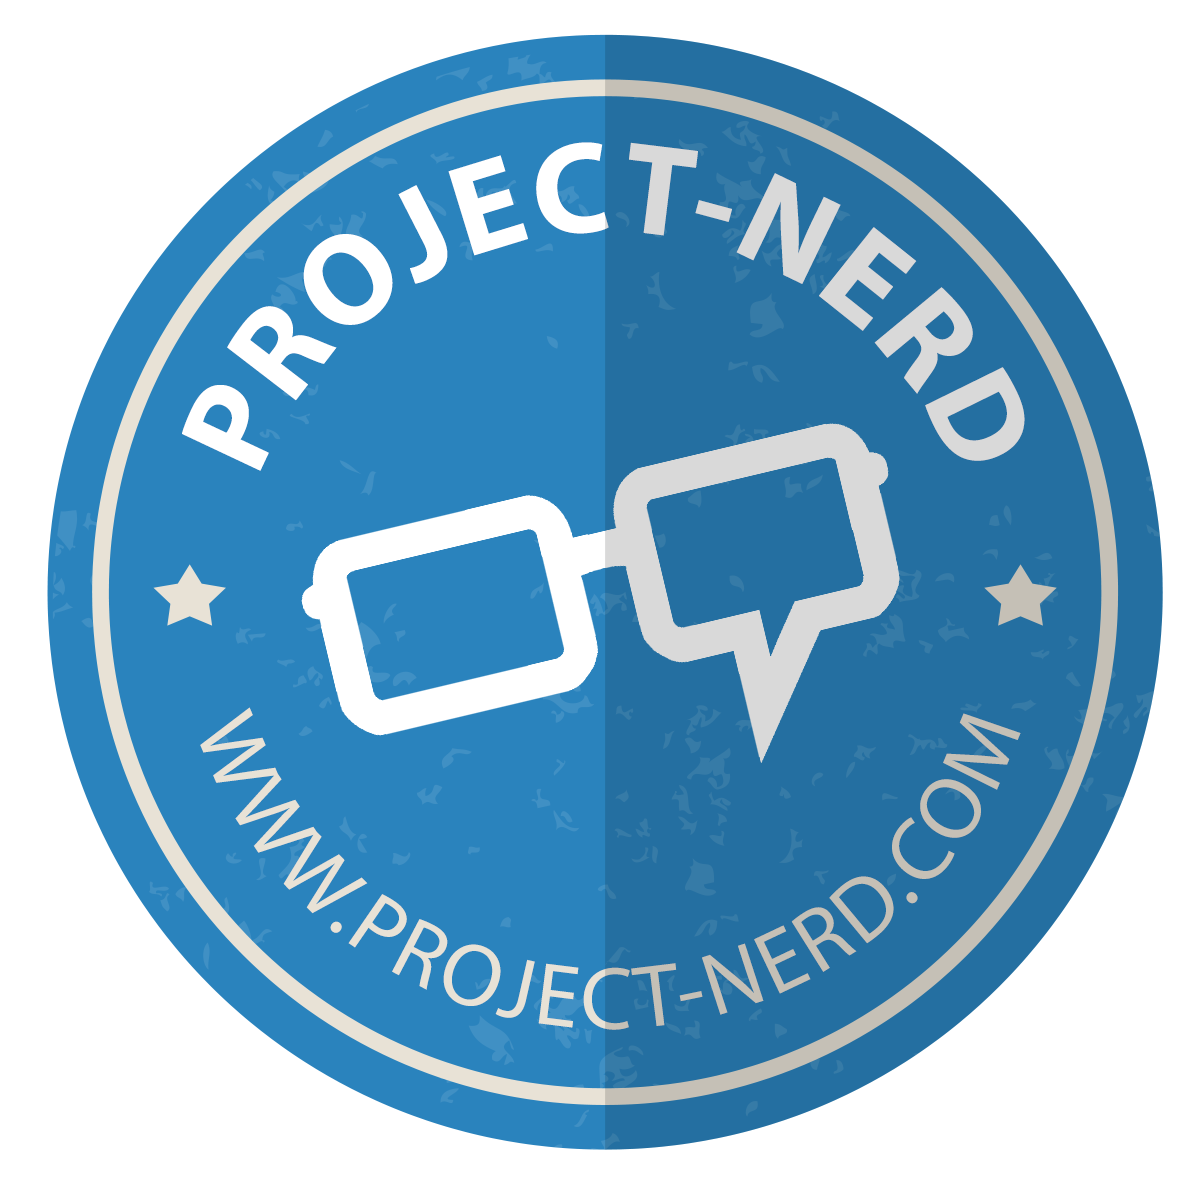 """Project-Nerd"""